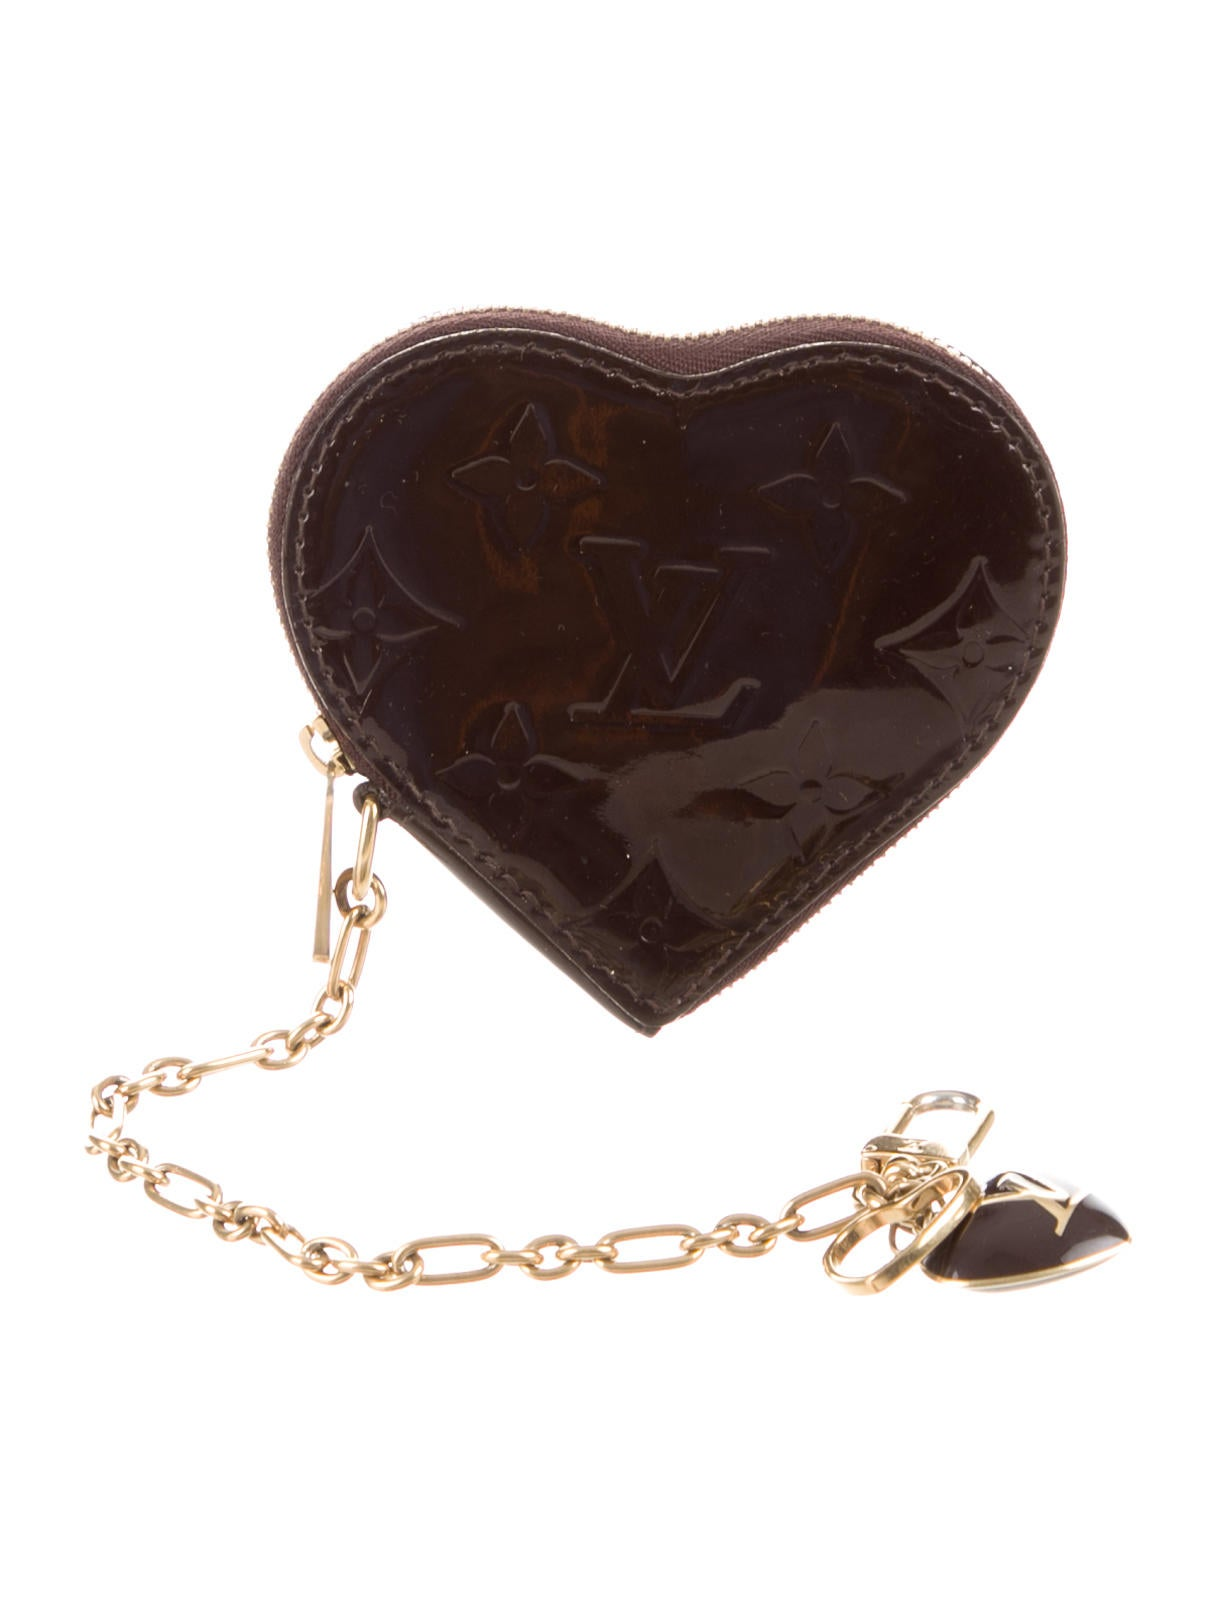 218639614a59 Louis Vuitton Vernis Heart Coin Purse - Accessories - LOU78612